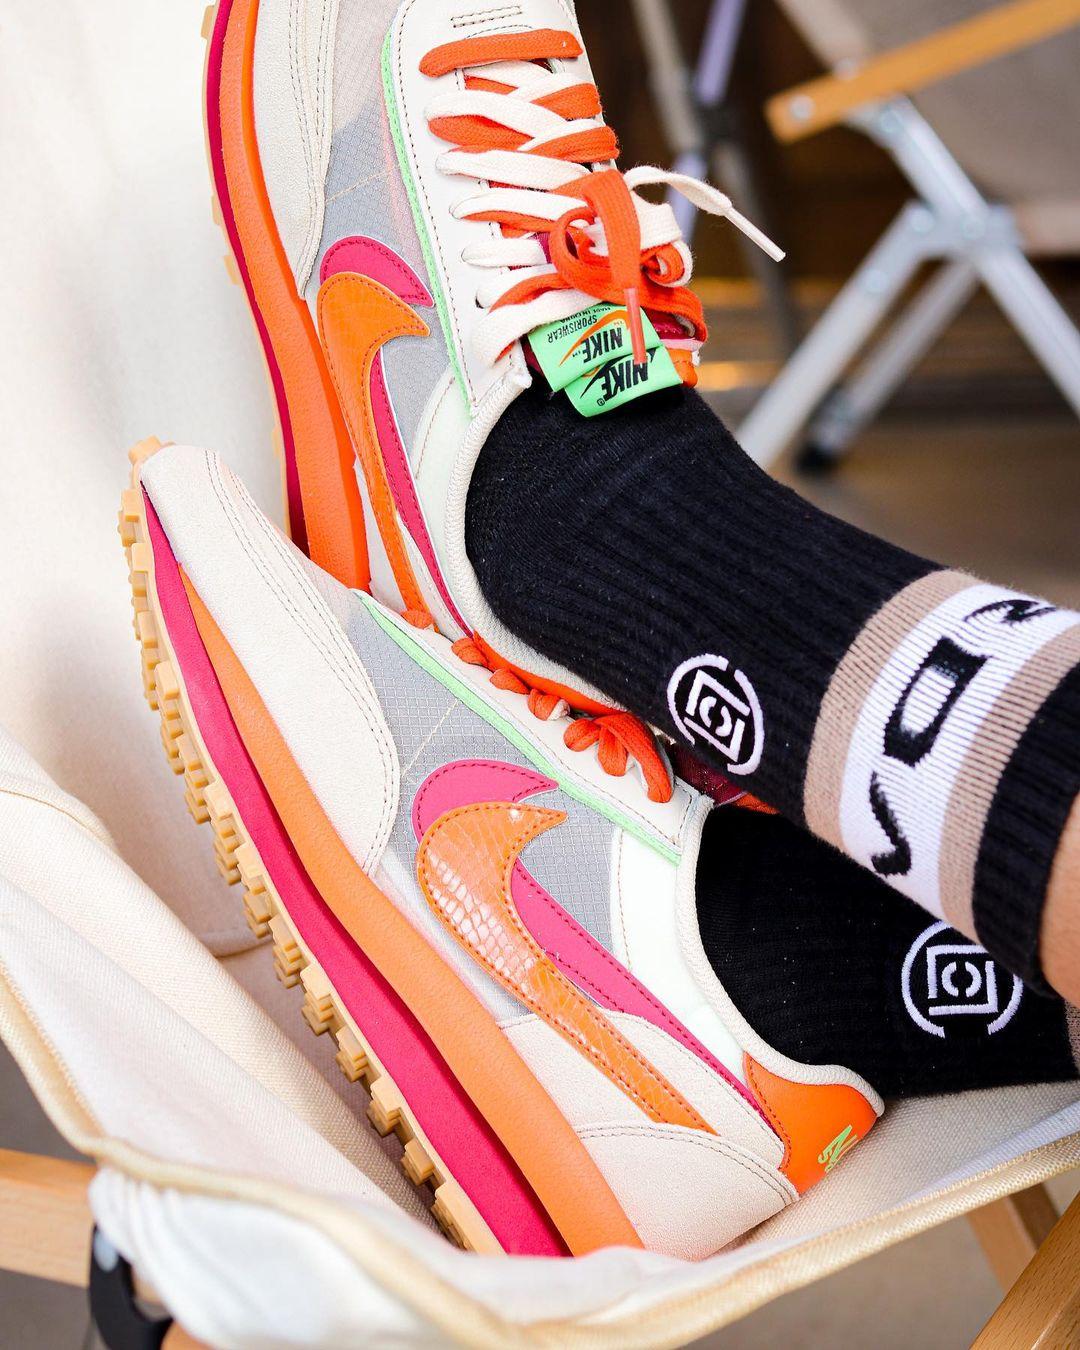 Nike,Yeezy,sacai,陈冠希,降价  十几双 Nike、Yeezy「集体暴跌」!sacai 价格被打下来了!最惨一双降 5K!